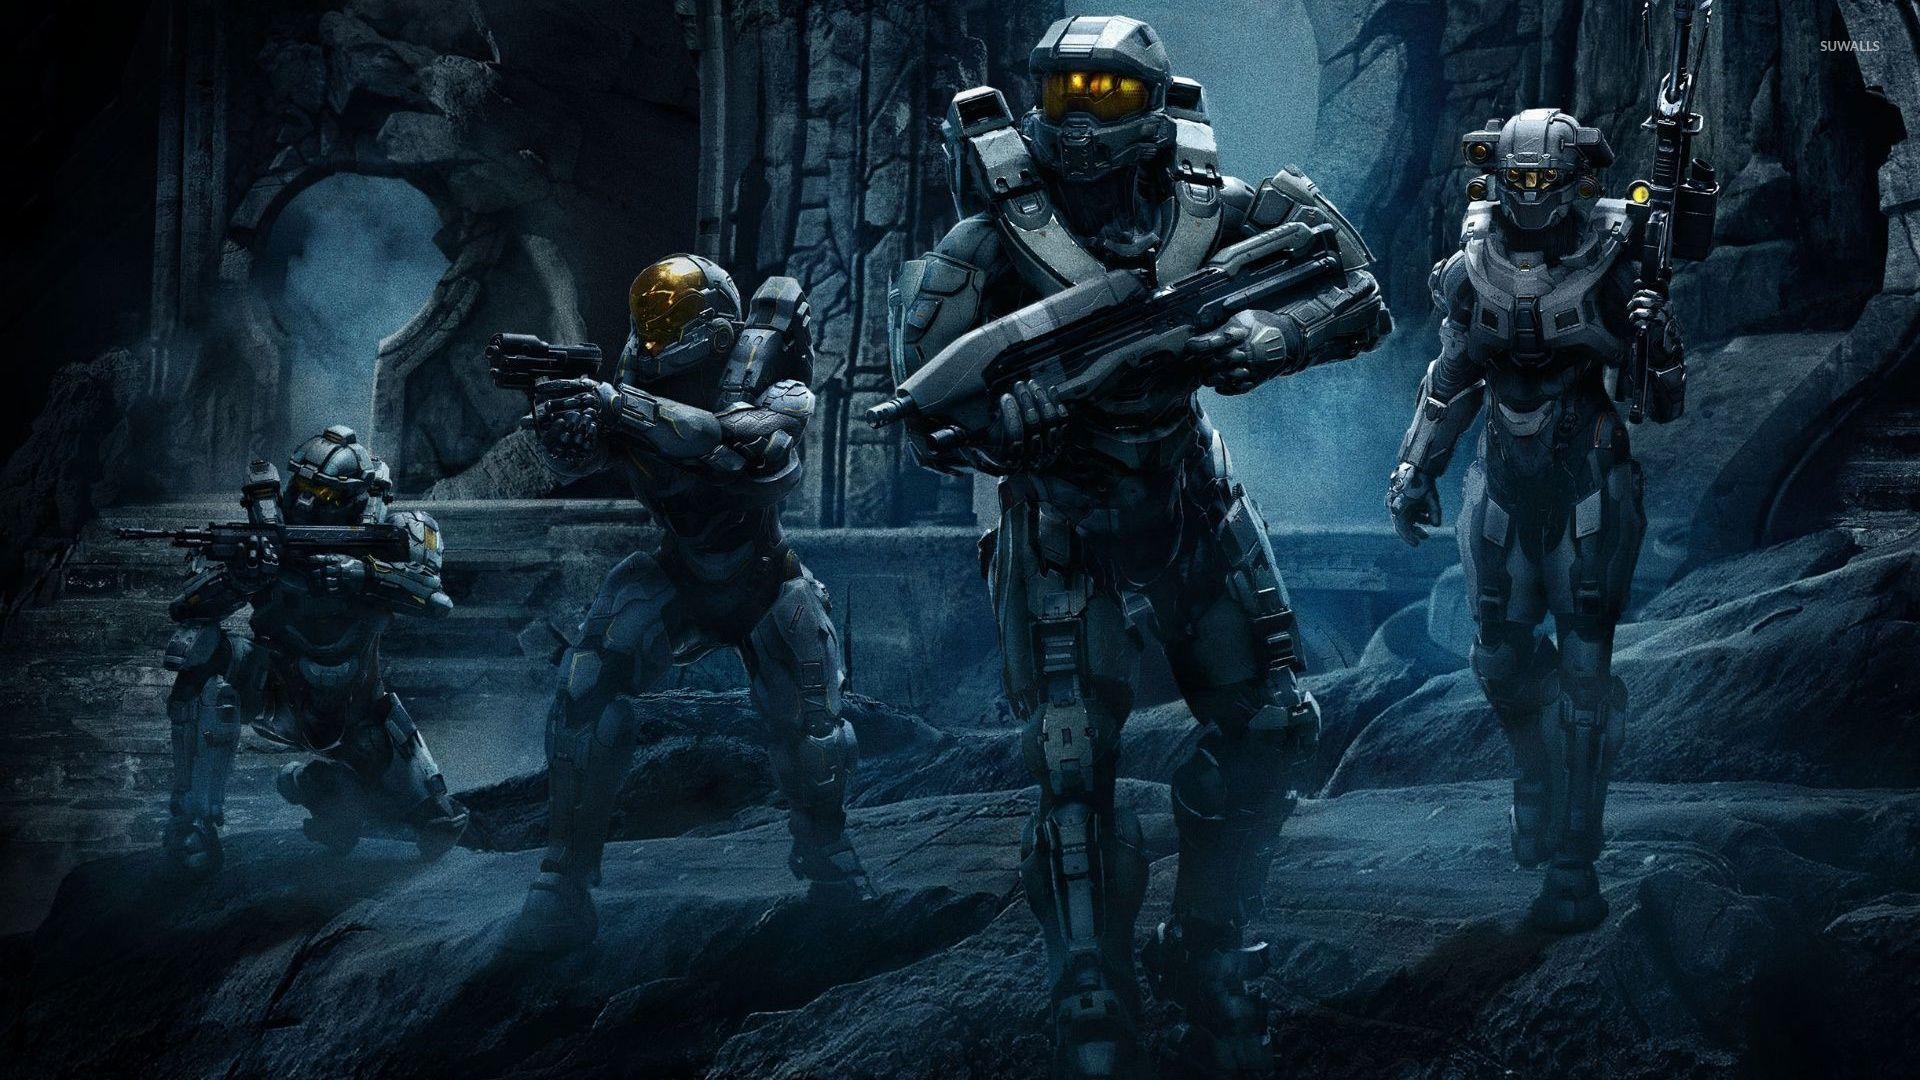 Halo 5 Guardians Wallpaper: Halo 5: Guardians [5] Wallpaper